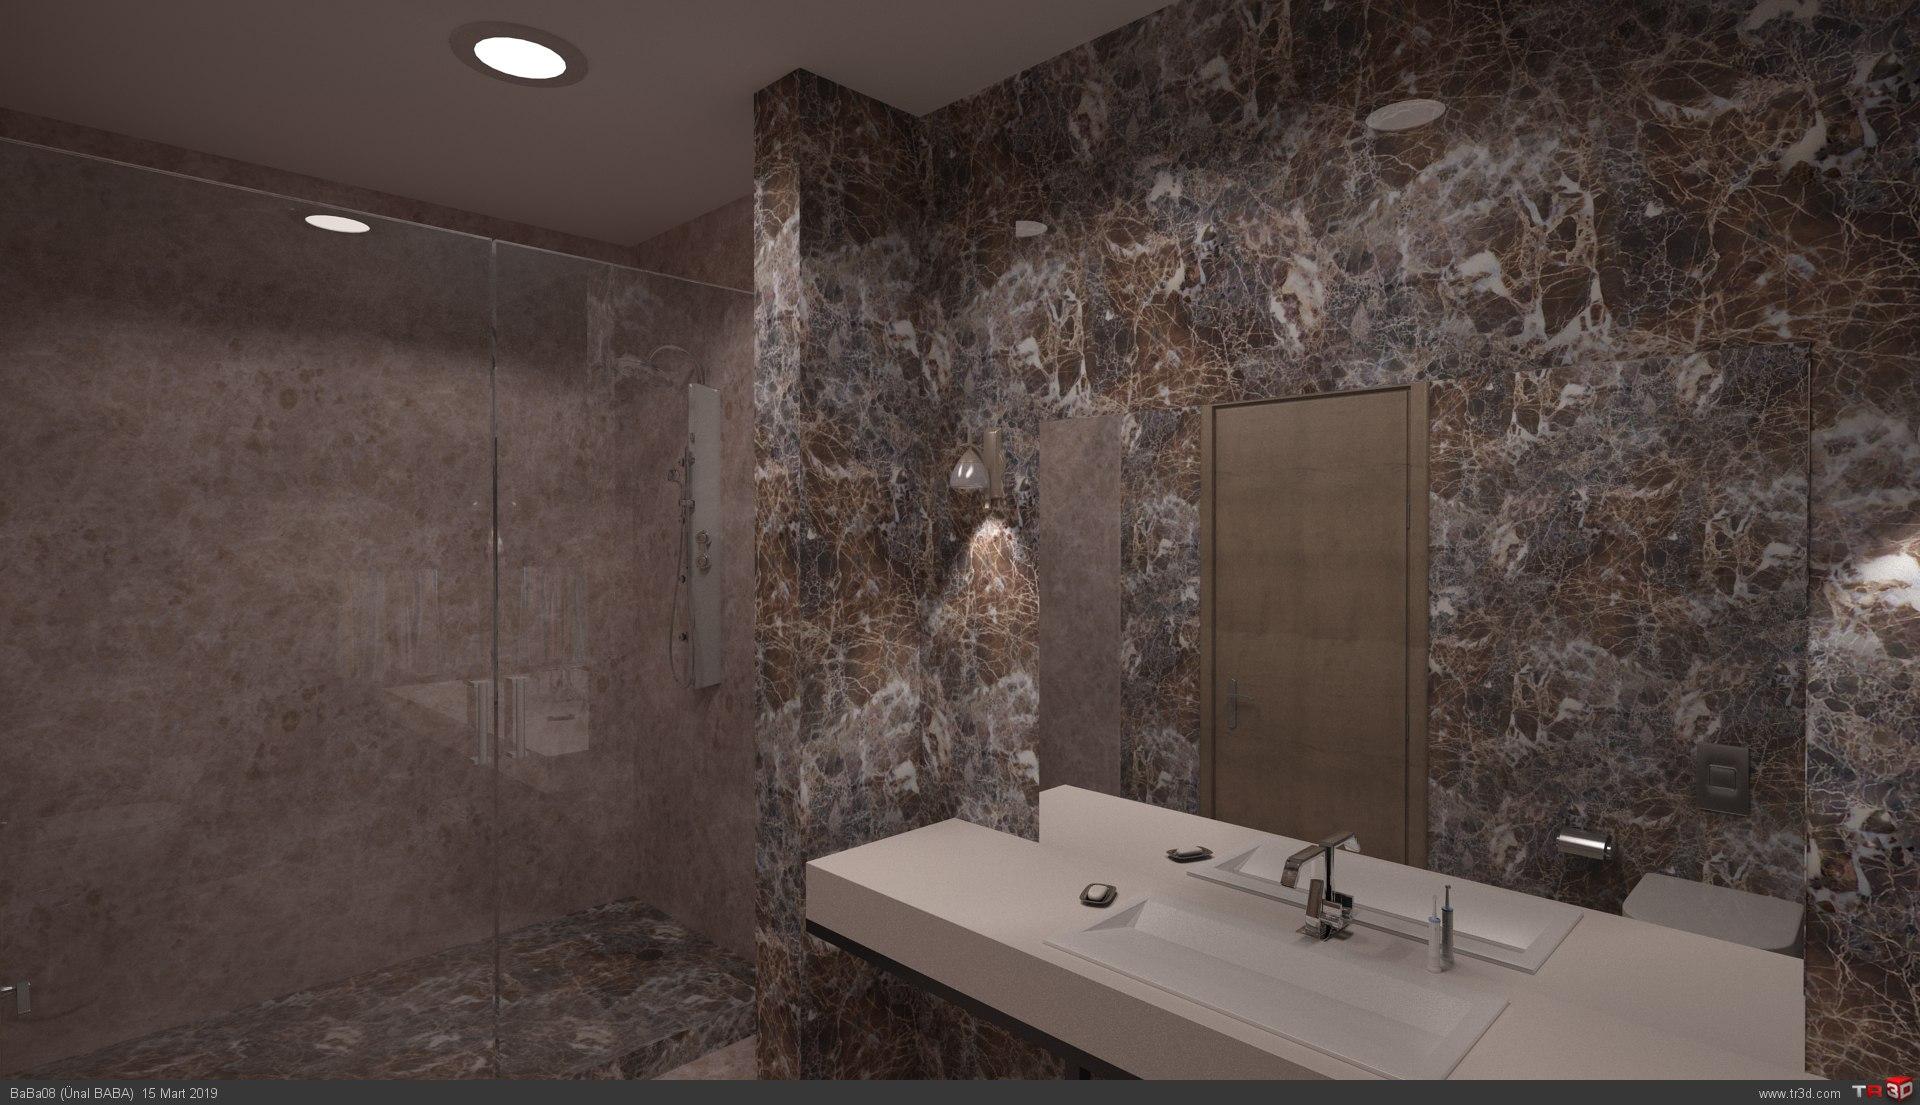 Villa İç Dekorasyonu - Mutfak ve Banyo  2